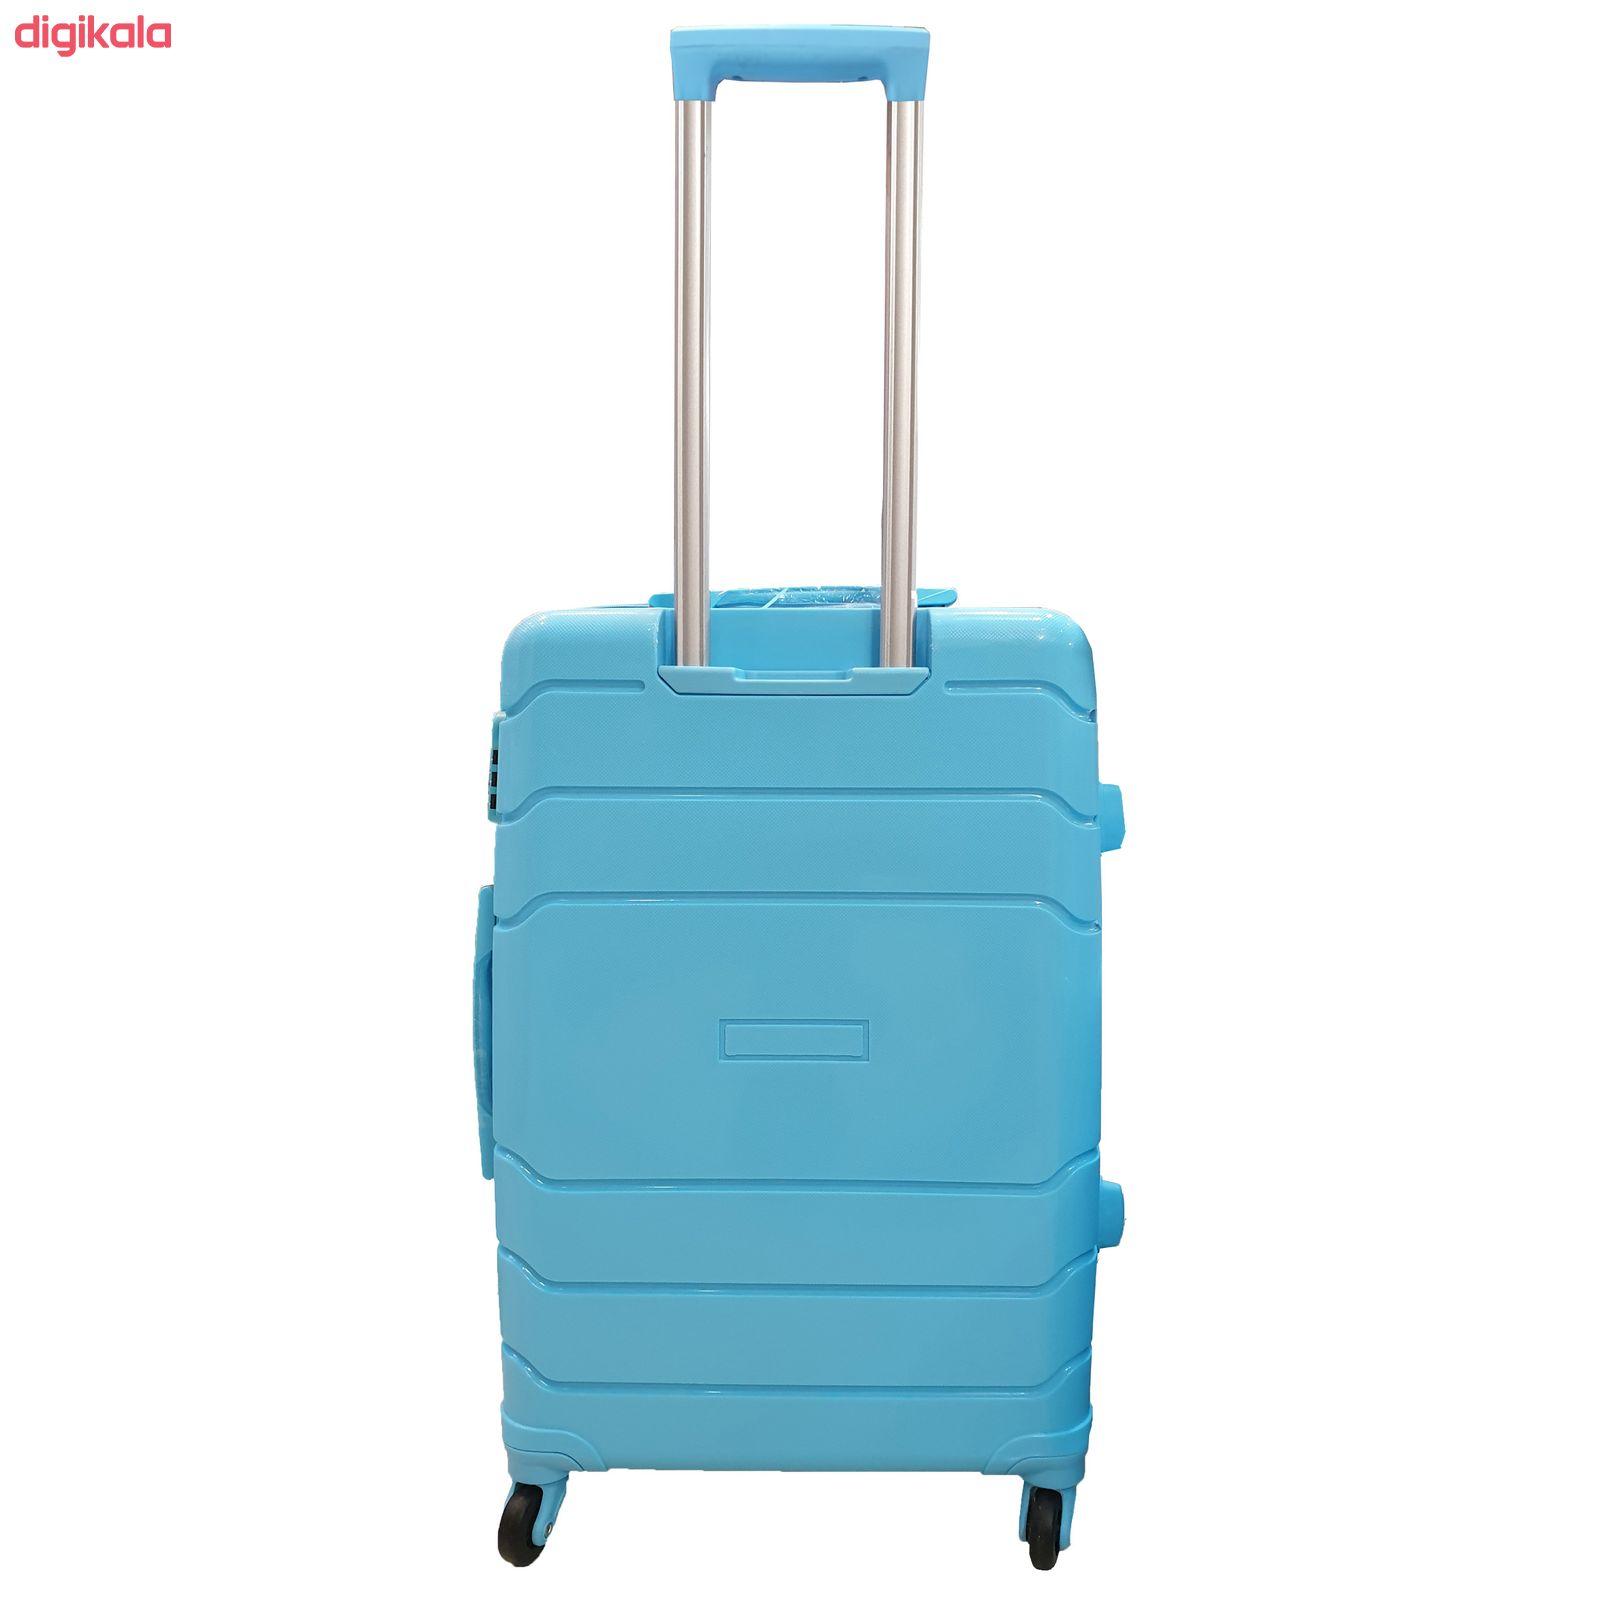 مجموعه سه عددی چمدان اسپید کد B016 main 1 1